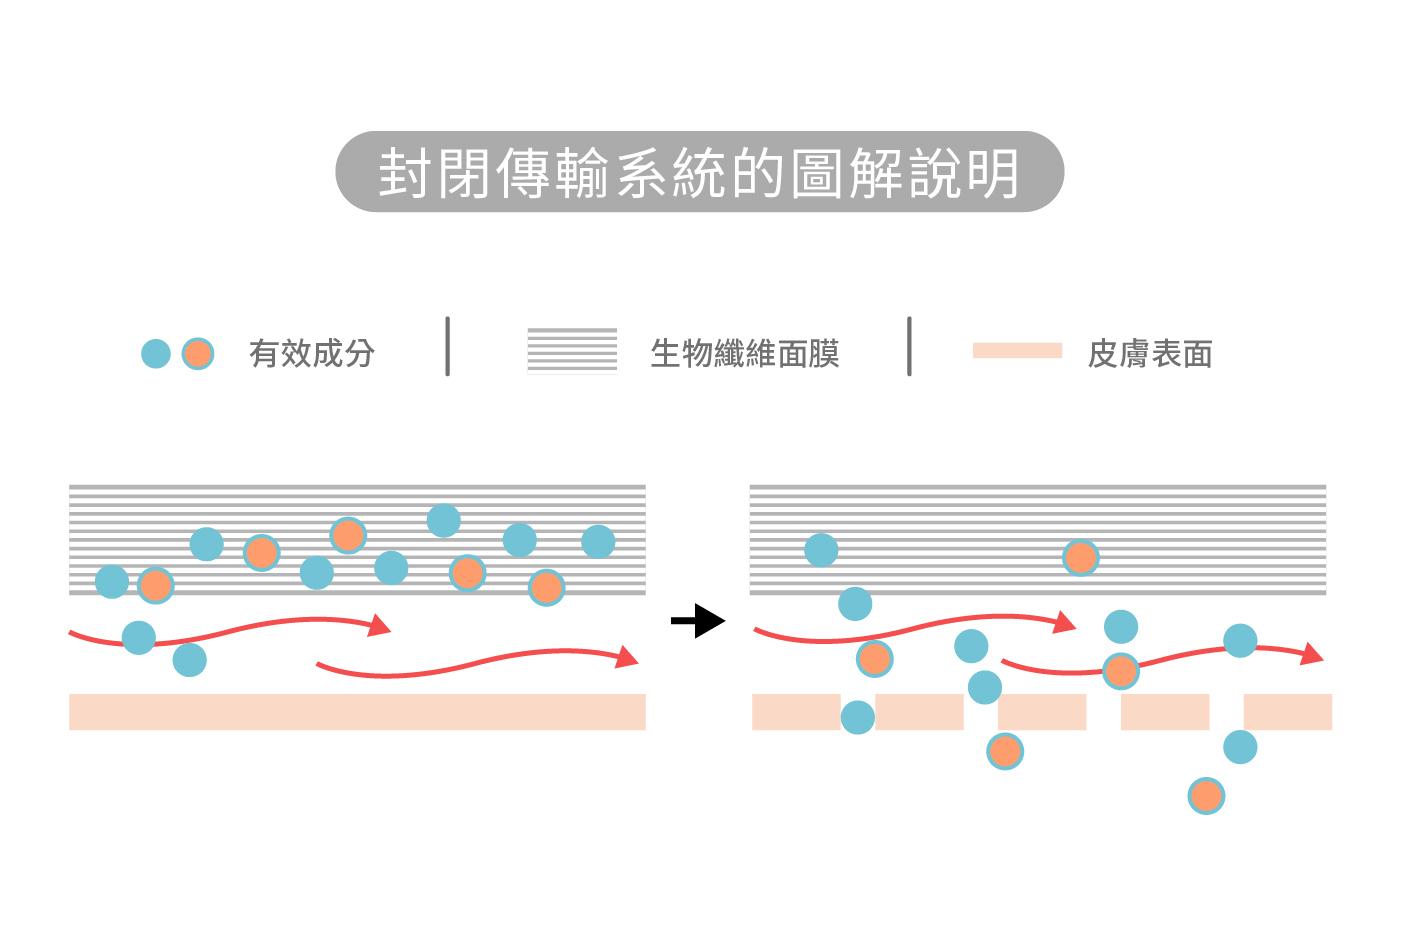 ODT (Occlusive Dressing Treatment)為新的經皮吸收技術,生物纖維面膜與肌膚間形成封閉傳輸系統